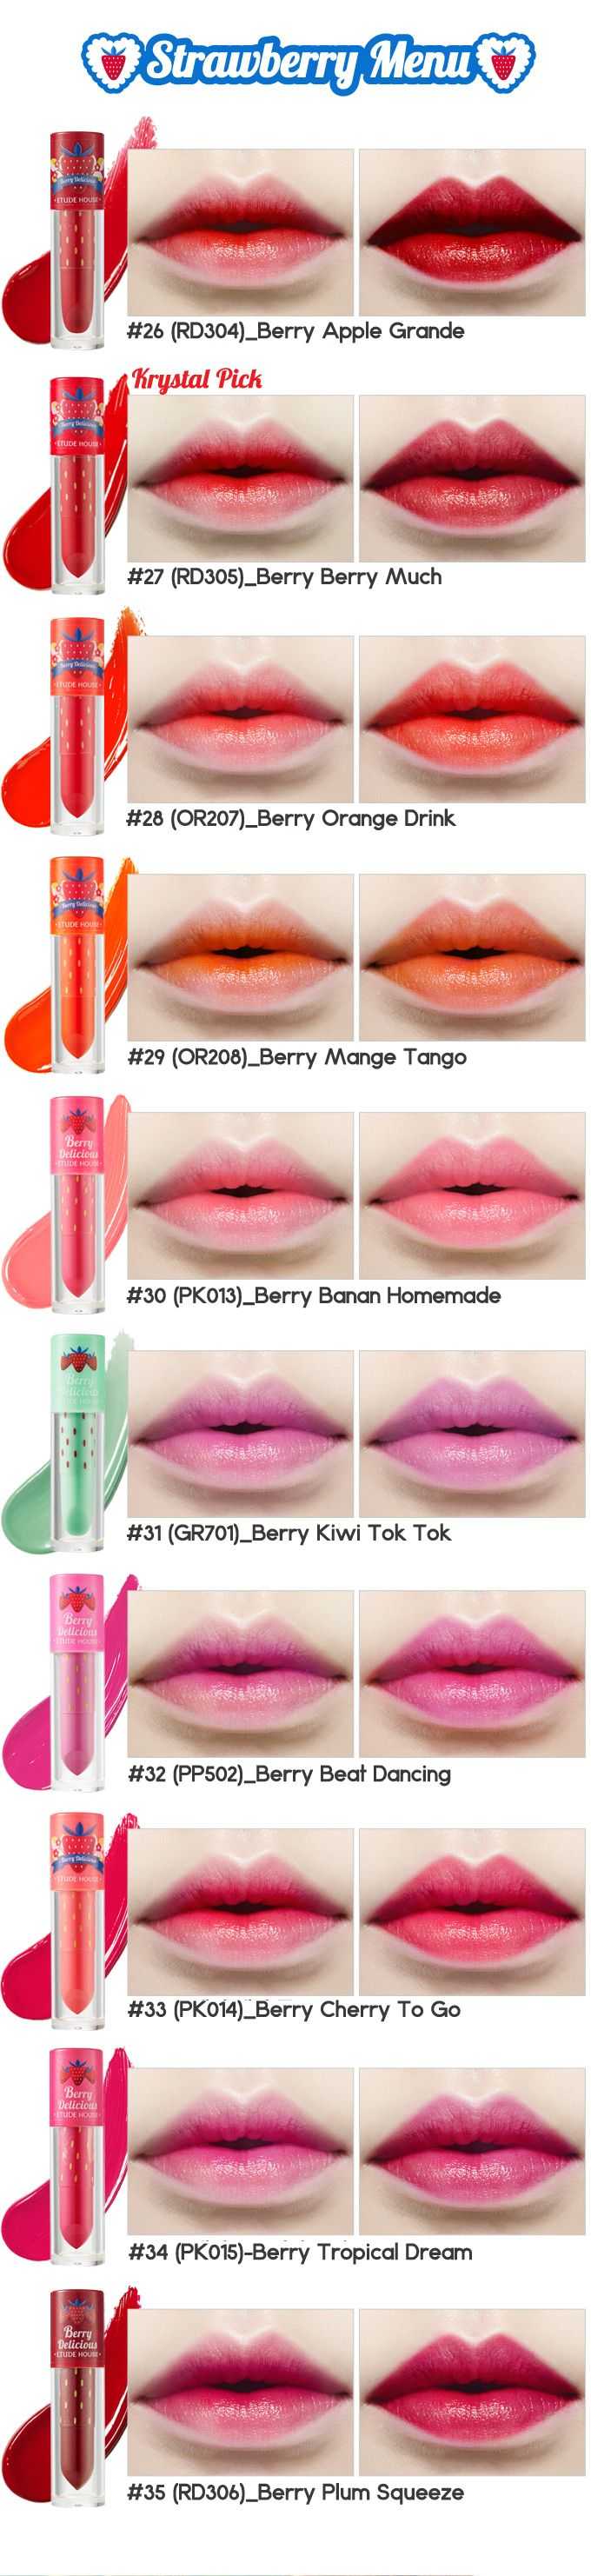 $9 Etude House Berry Delicious Color In Liquid Lips Juicy 3.5g